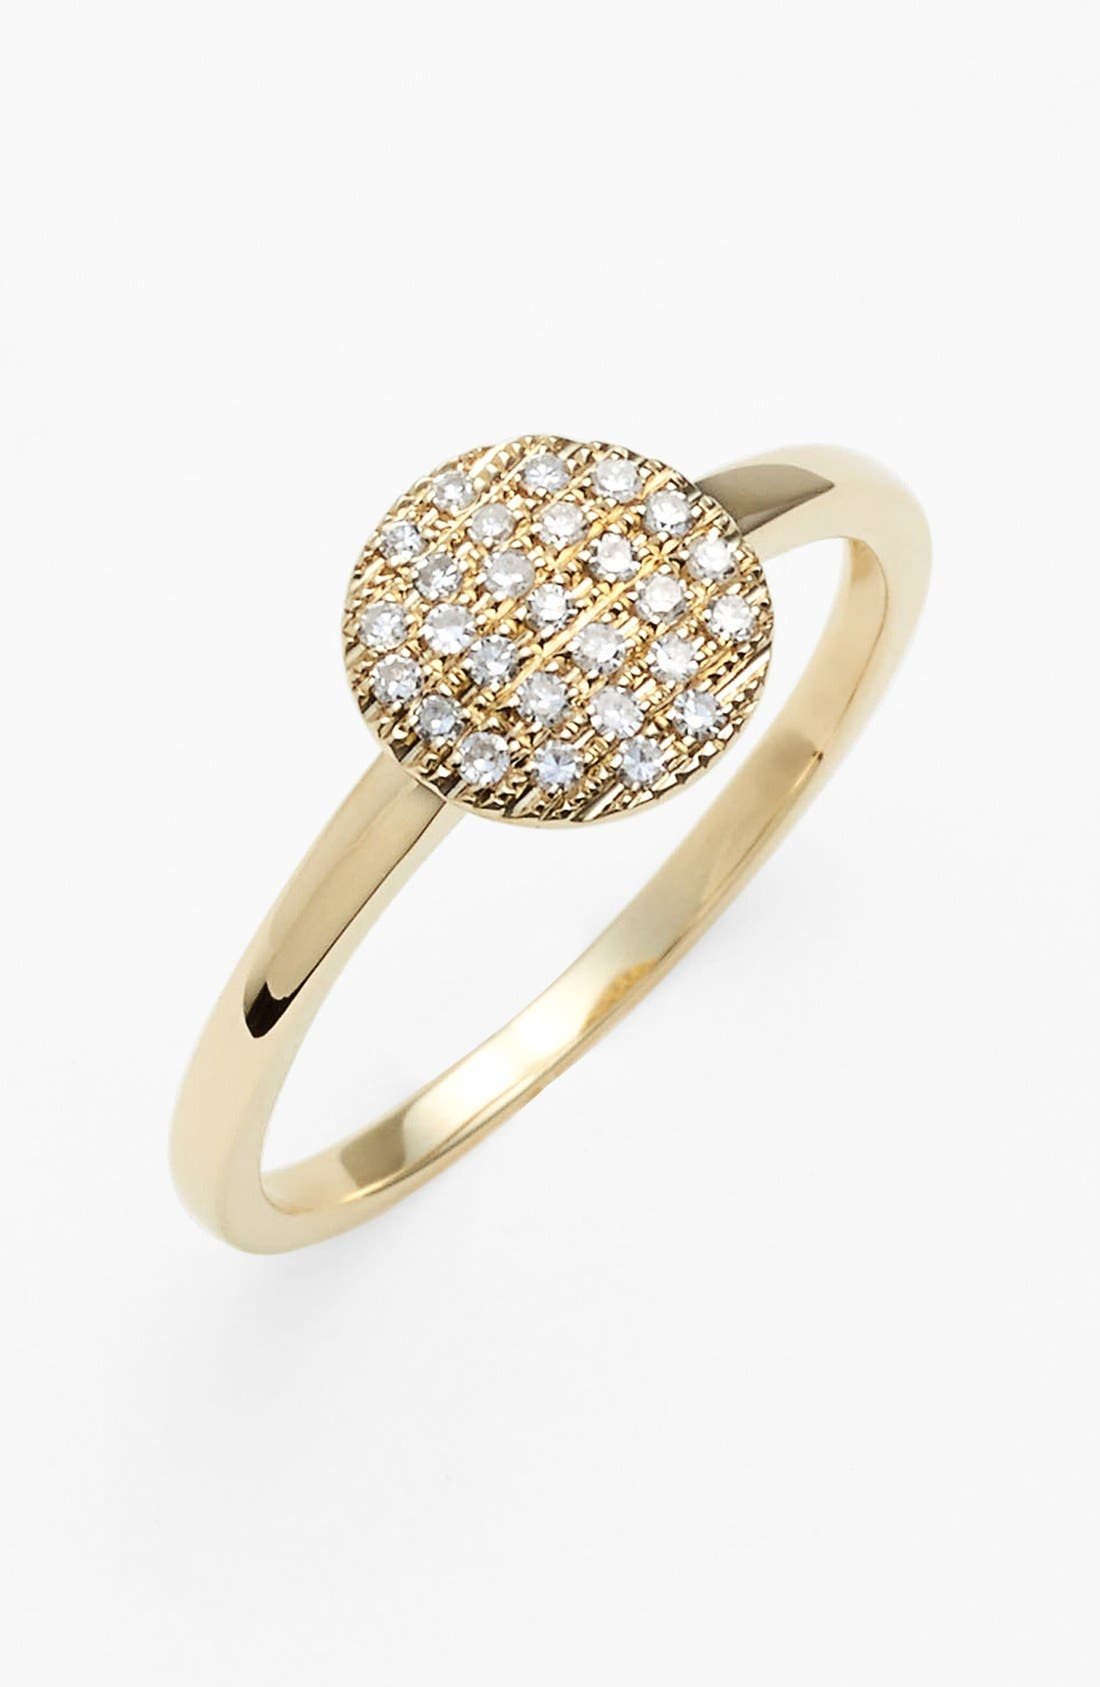 Main Image - Dana Rebecca Designs 'Lauren Joy' Diamond Ring